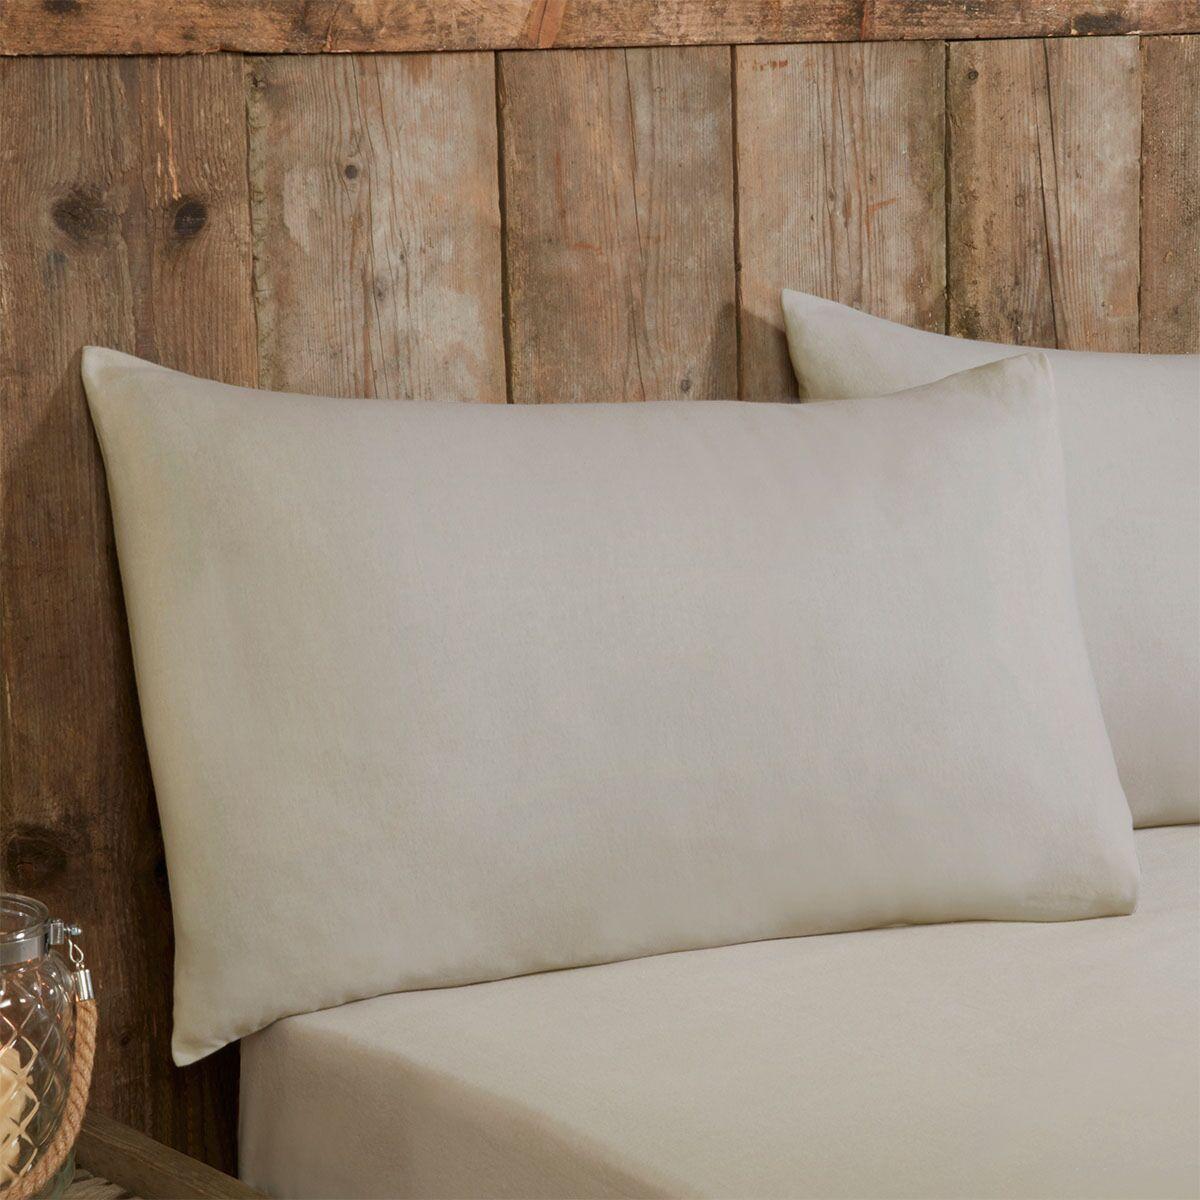 Robert Dyas - Silentnight Pillowcases Pair - Natural - Free C&C £2.50